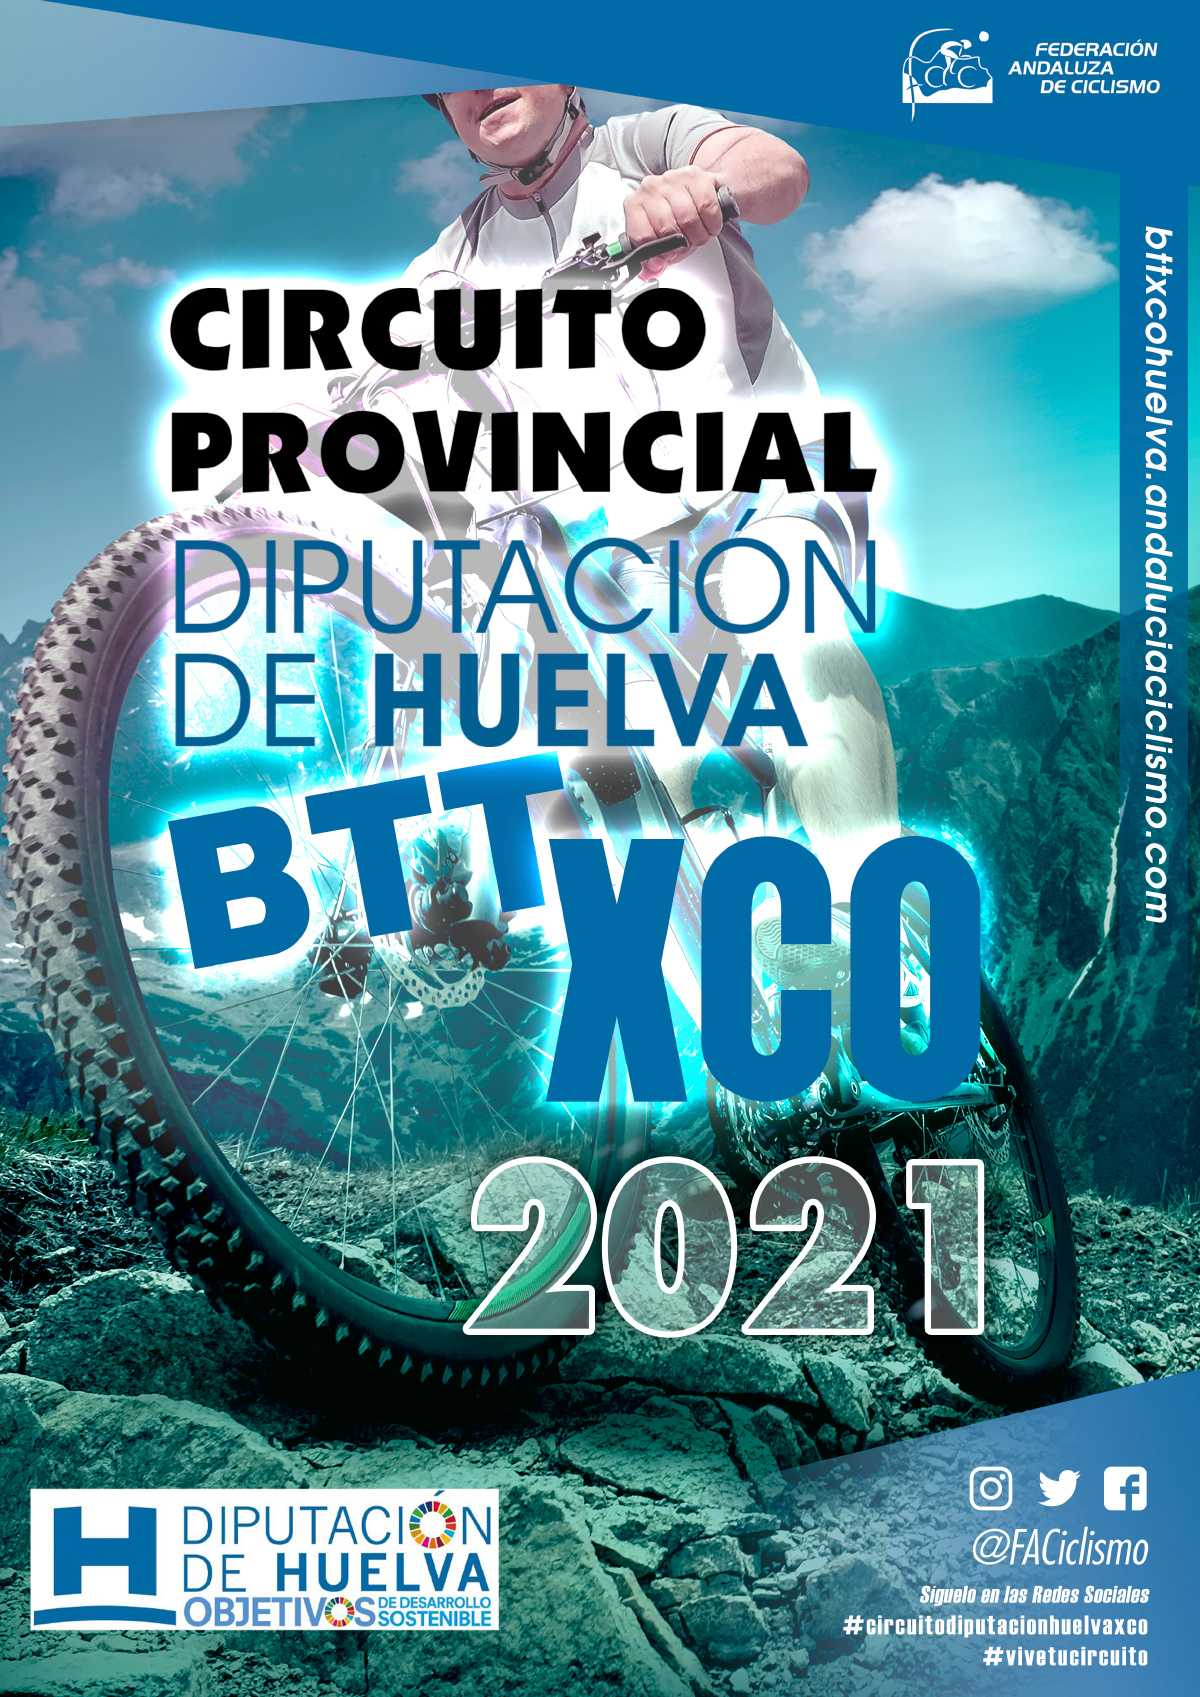 Cartaya se suma al Circuito Diputación de Huelva BTT XCO 2021